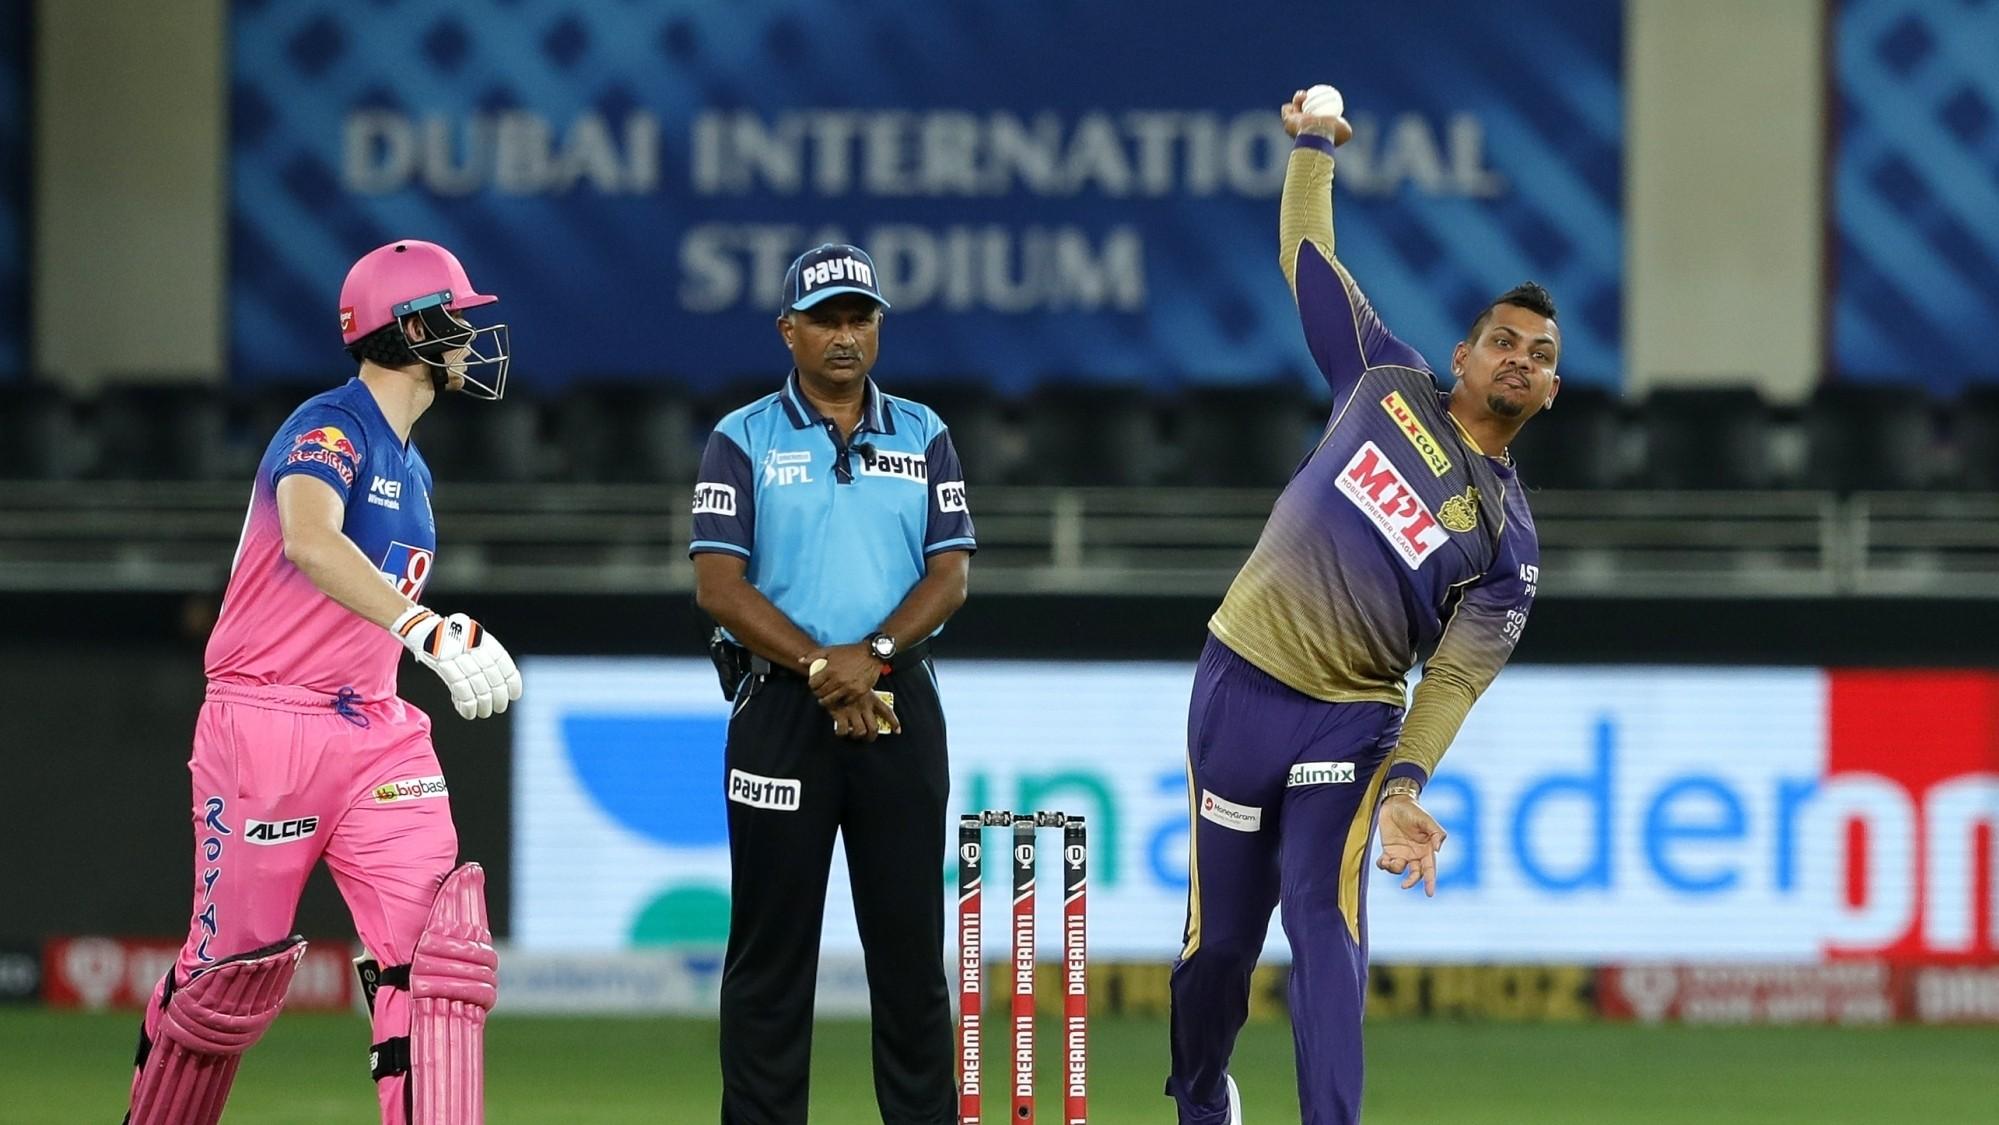 IPL 2020: KKR left surprised after Sunil Narine gets reported for suspect actionagain